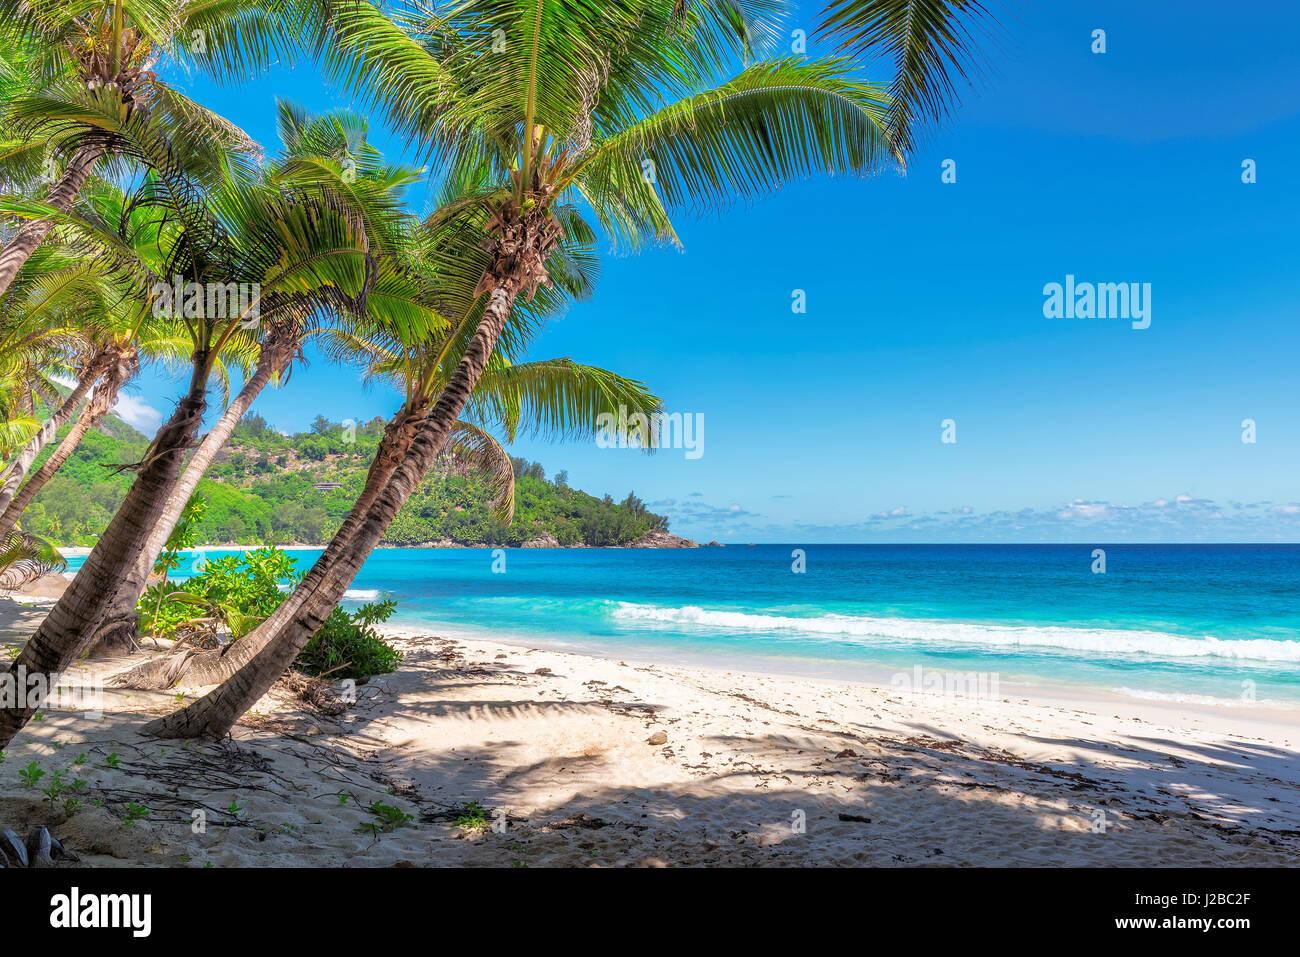 amazing Anse Intendance beach, Mahe island, Seychelles. - Stock Image